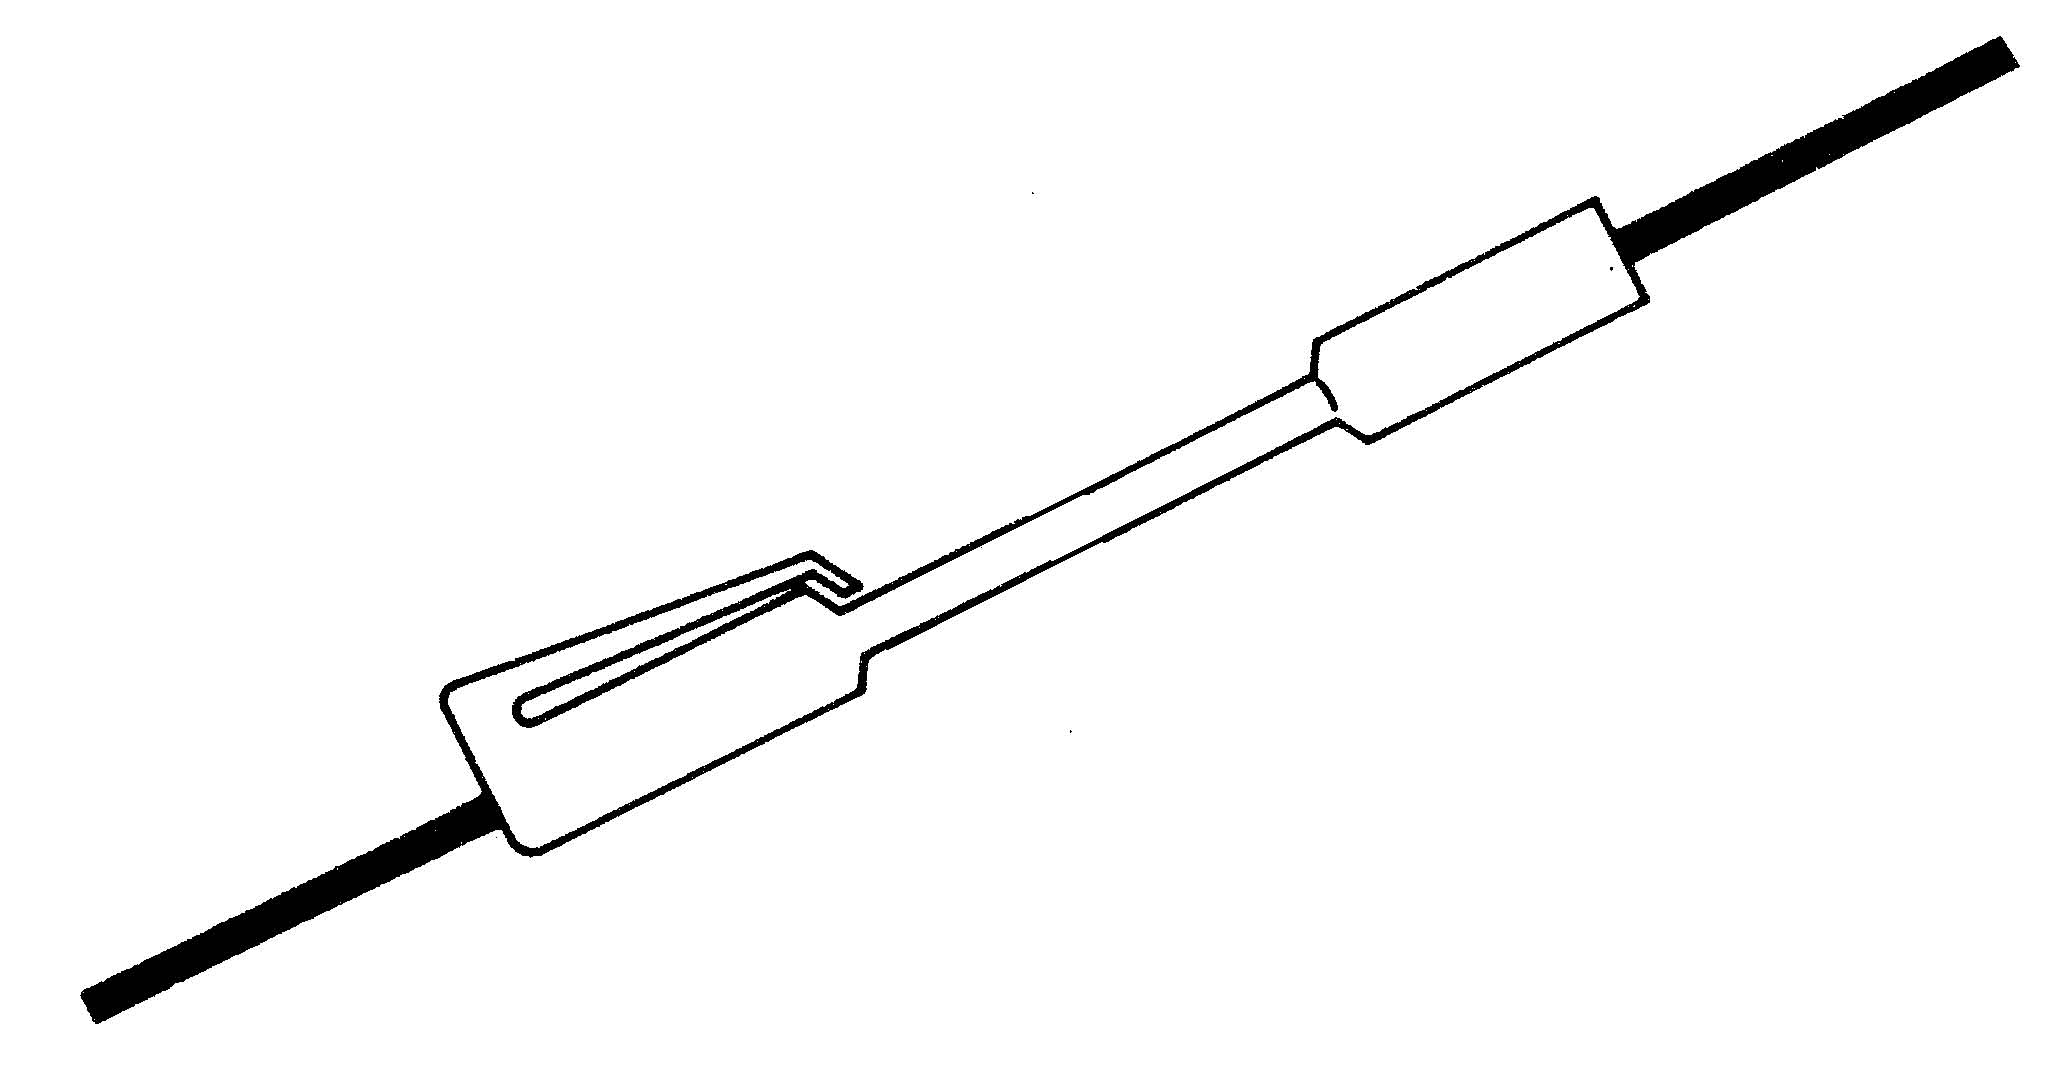 Calibration Tools For Pneumatic Hvac Temperature Control